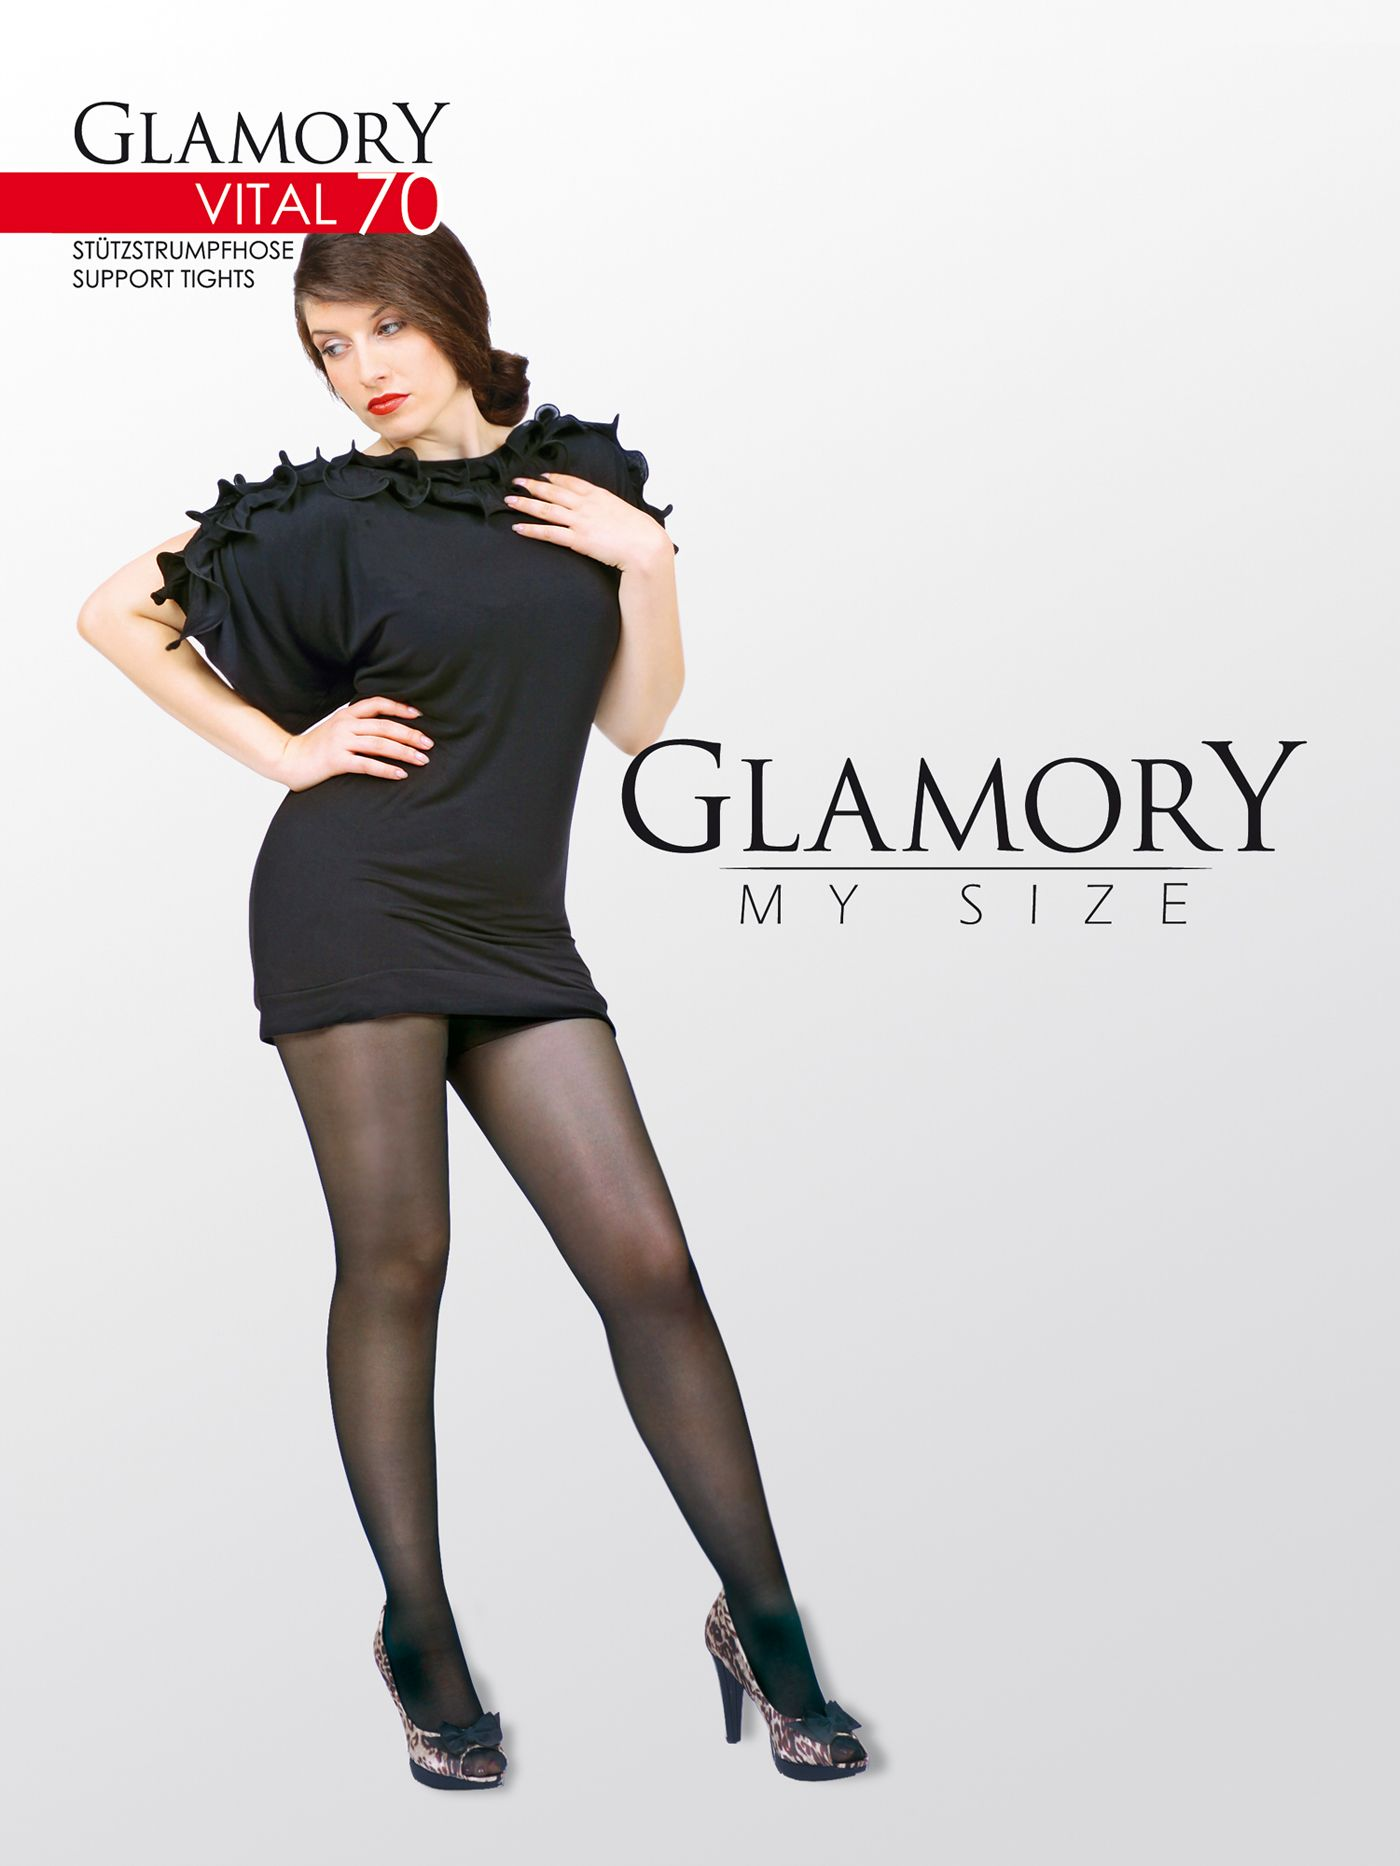 5d488b7cab56b Glamory Vital 70 Tights Lingerie Plus, Sexy Lingerie, Net Shopping, Plus  Size,